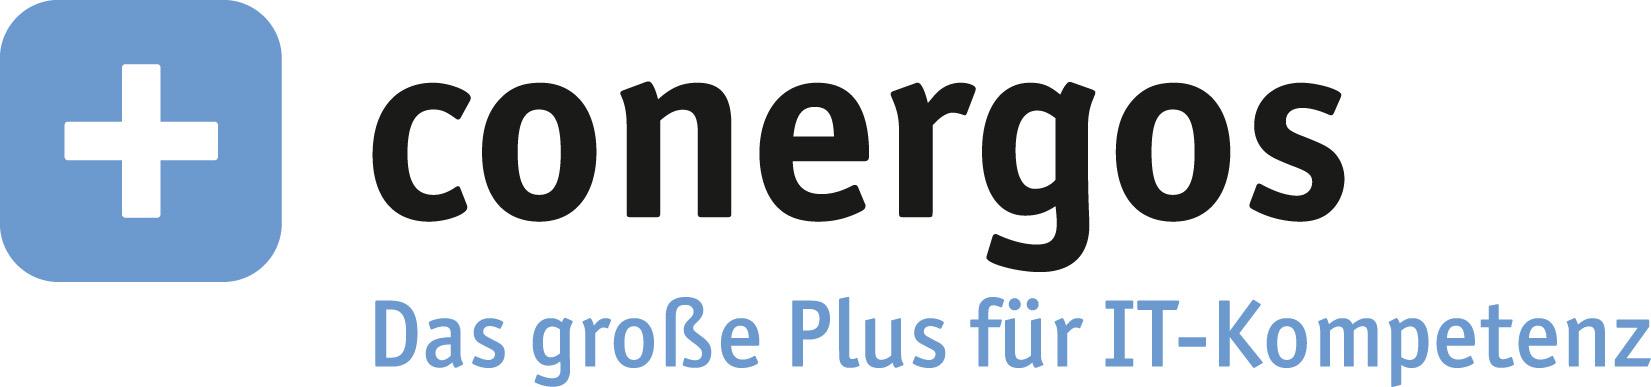 Conergos GmbH & Co. KG Logo